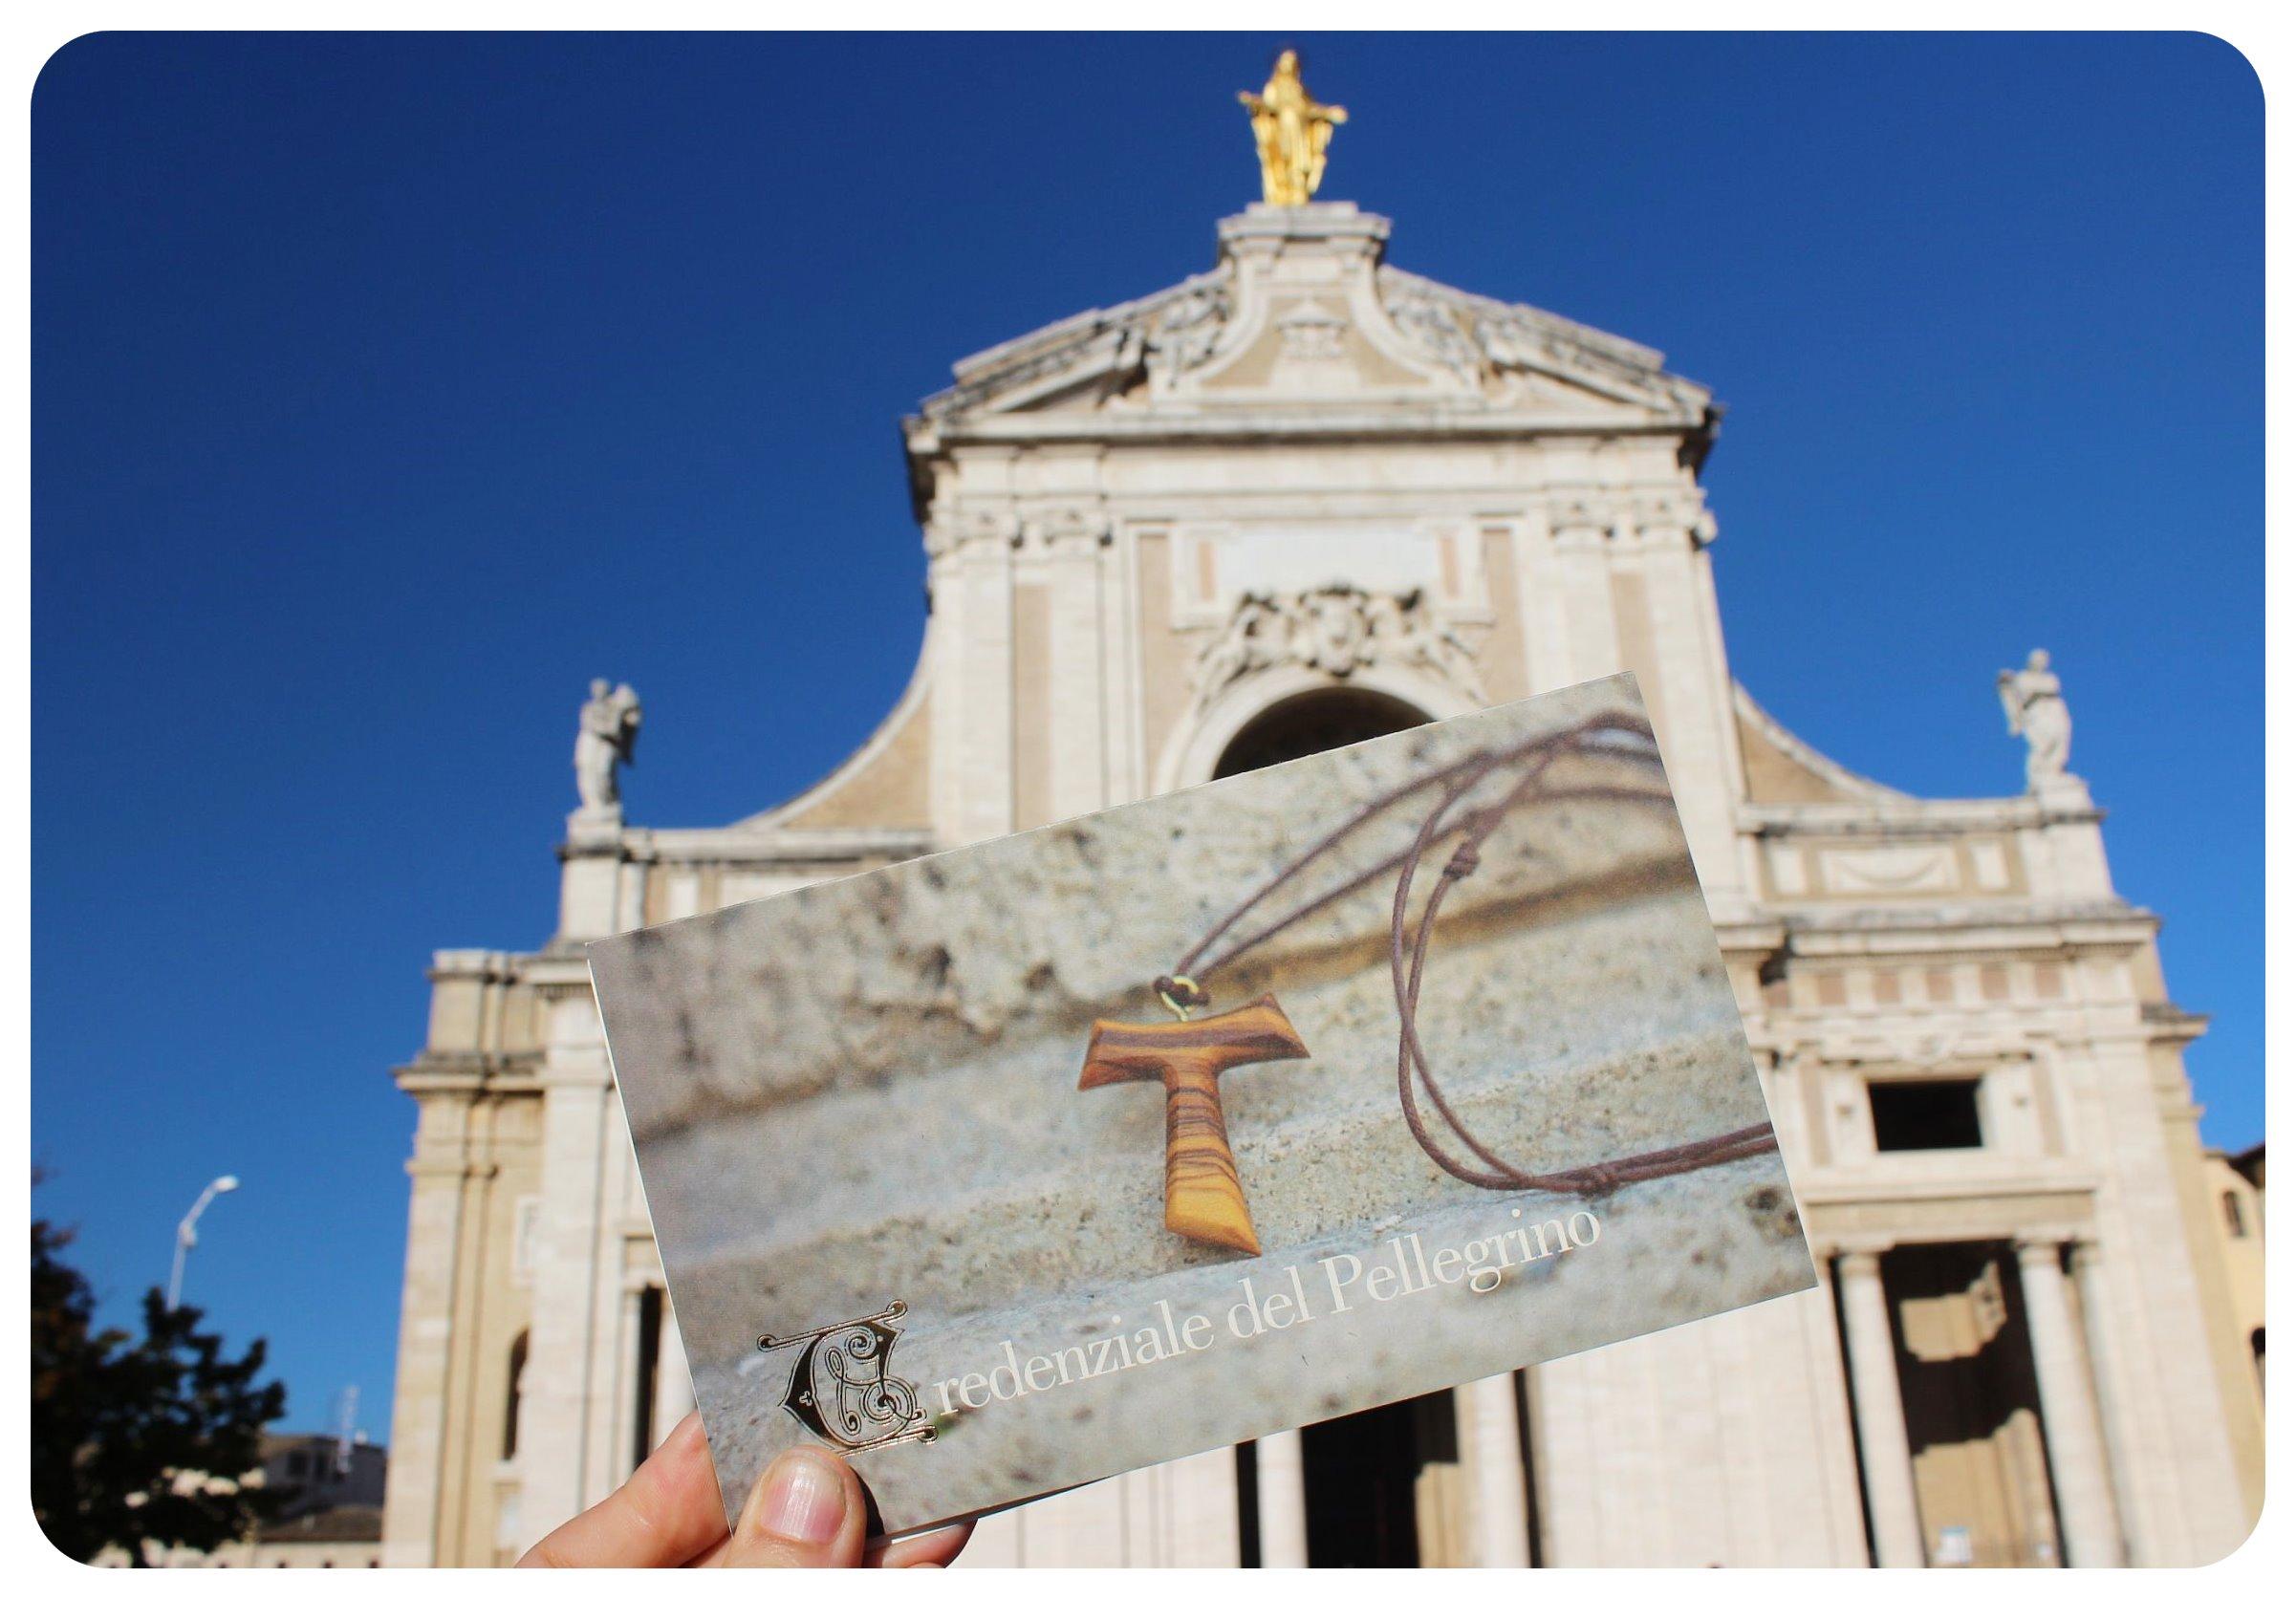 assisi pilgrims passport